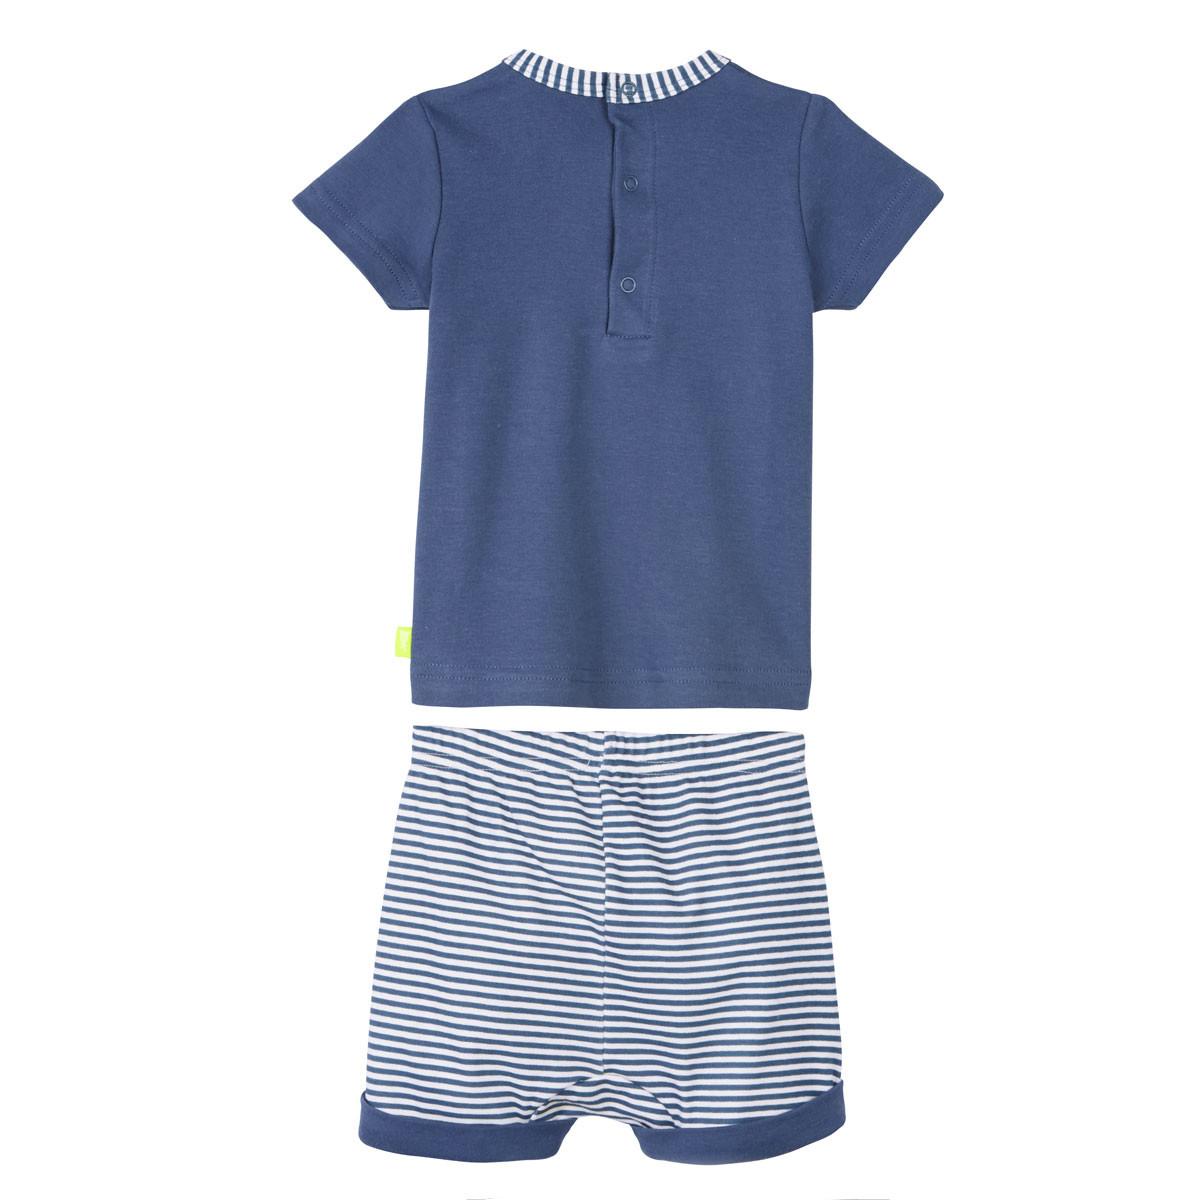 Ensemble bébé garçon t-shirt + short Baby Beach Club dos